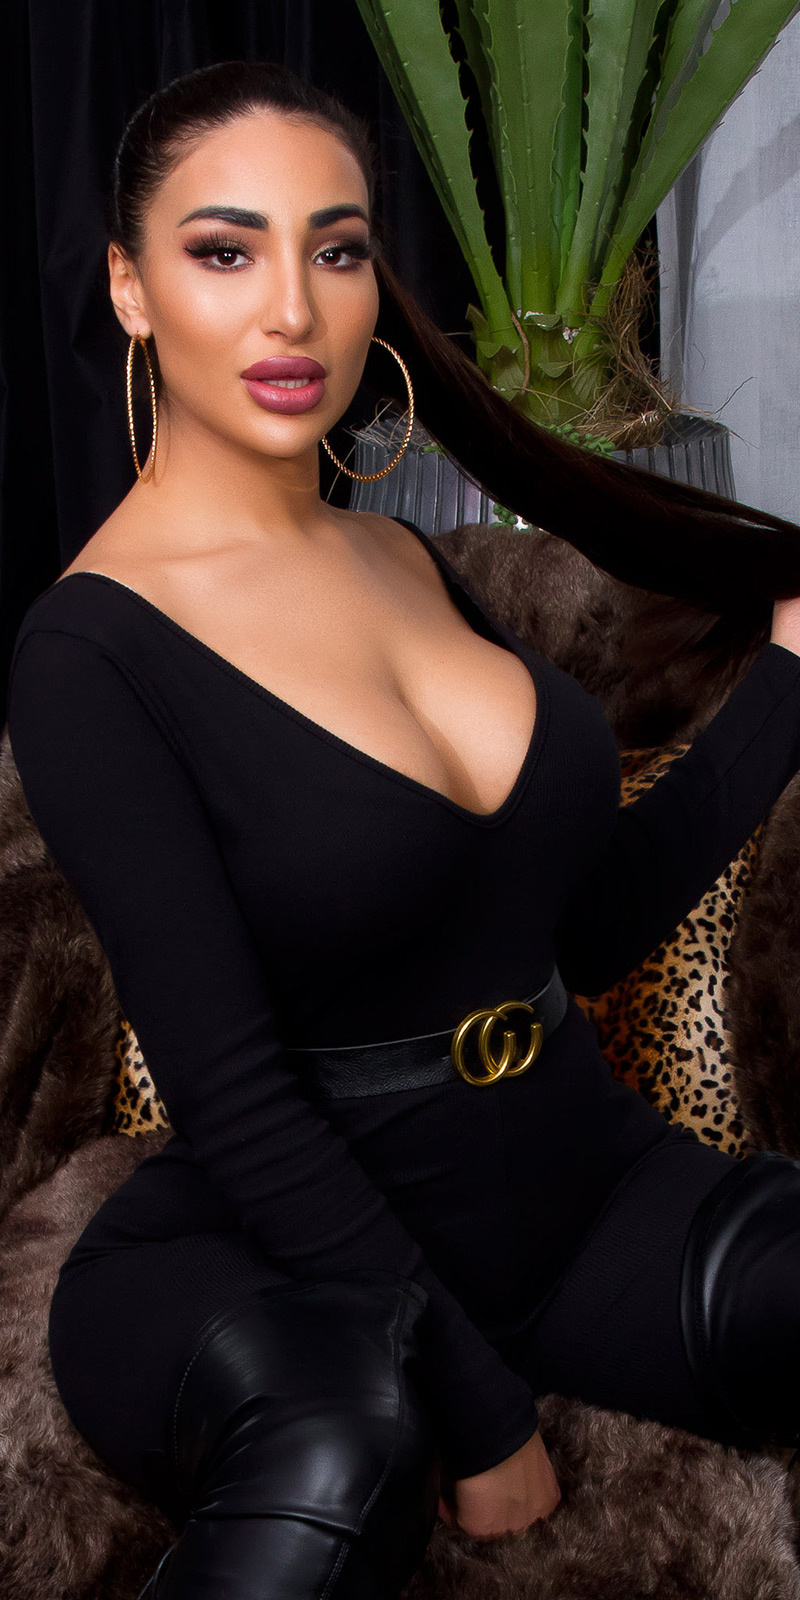 Sexy v-halter overall met riem zwart